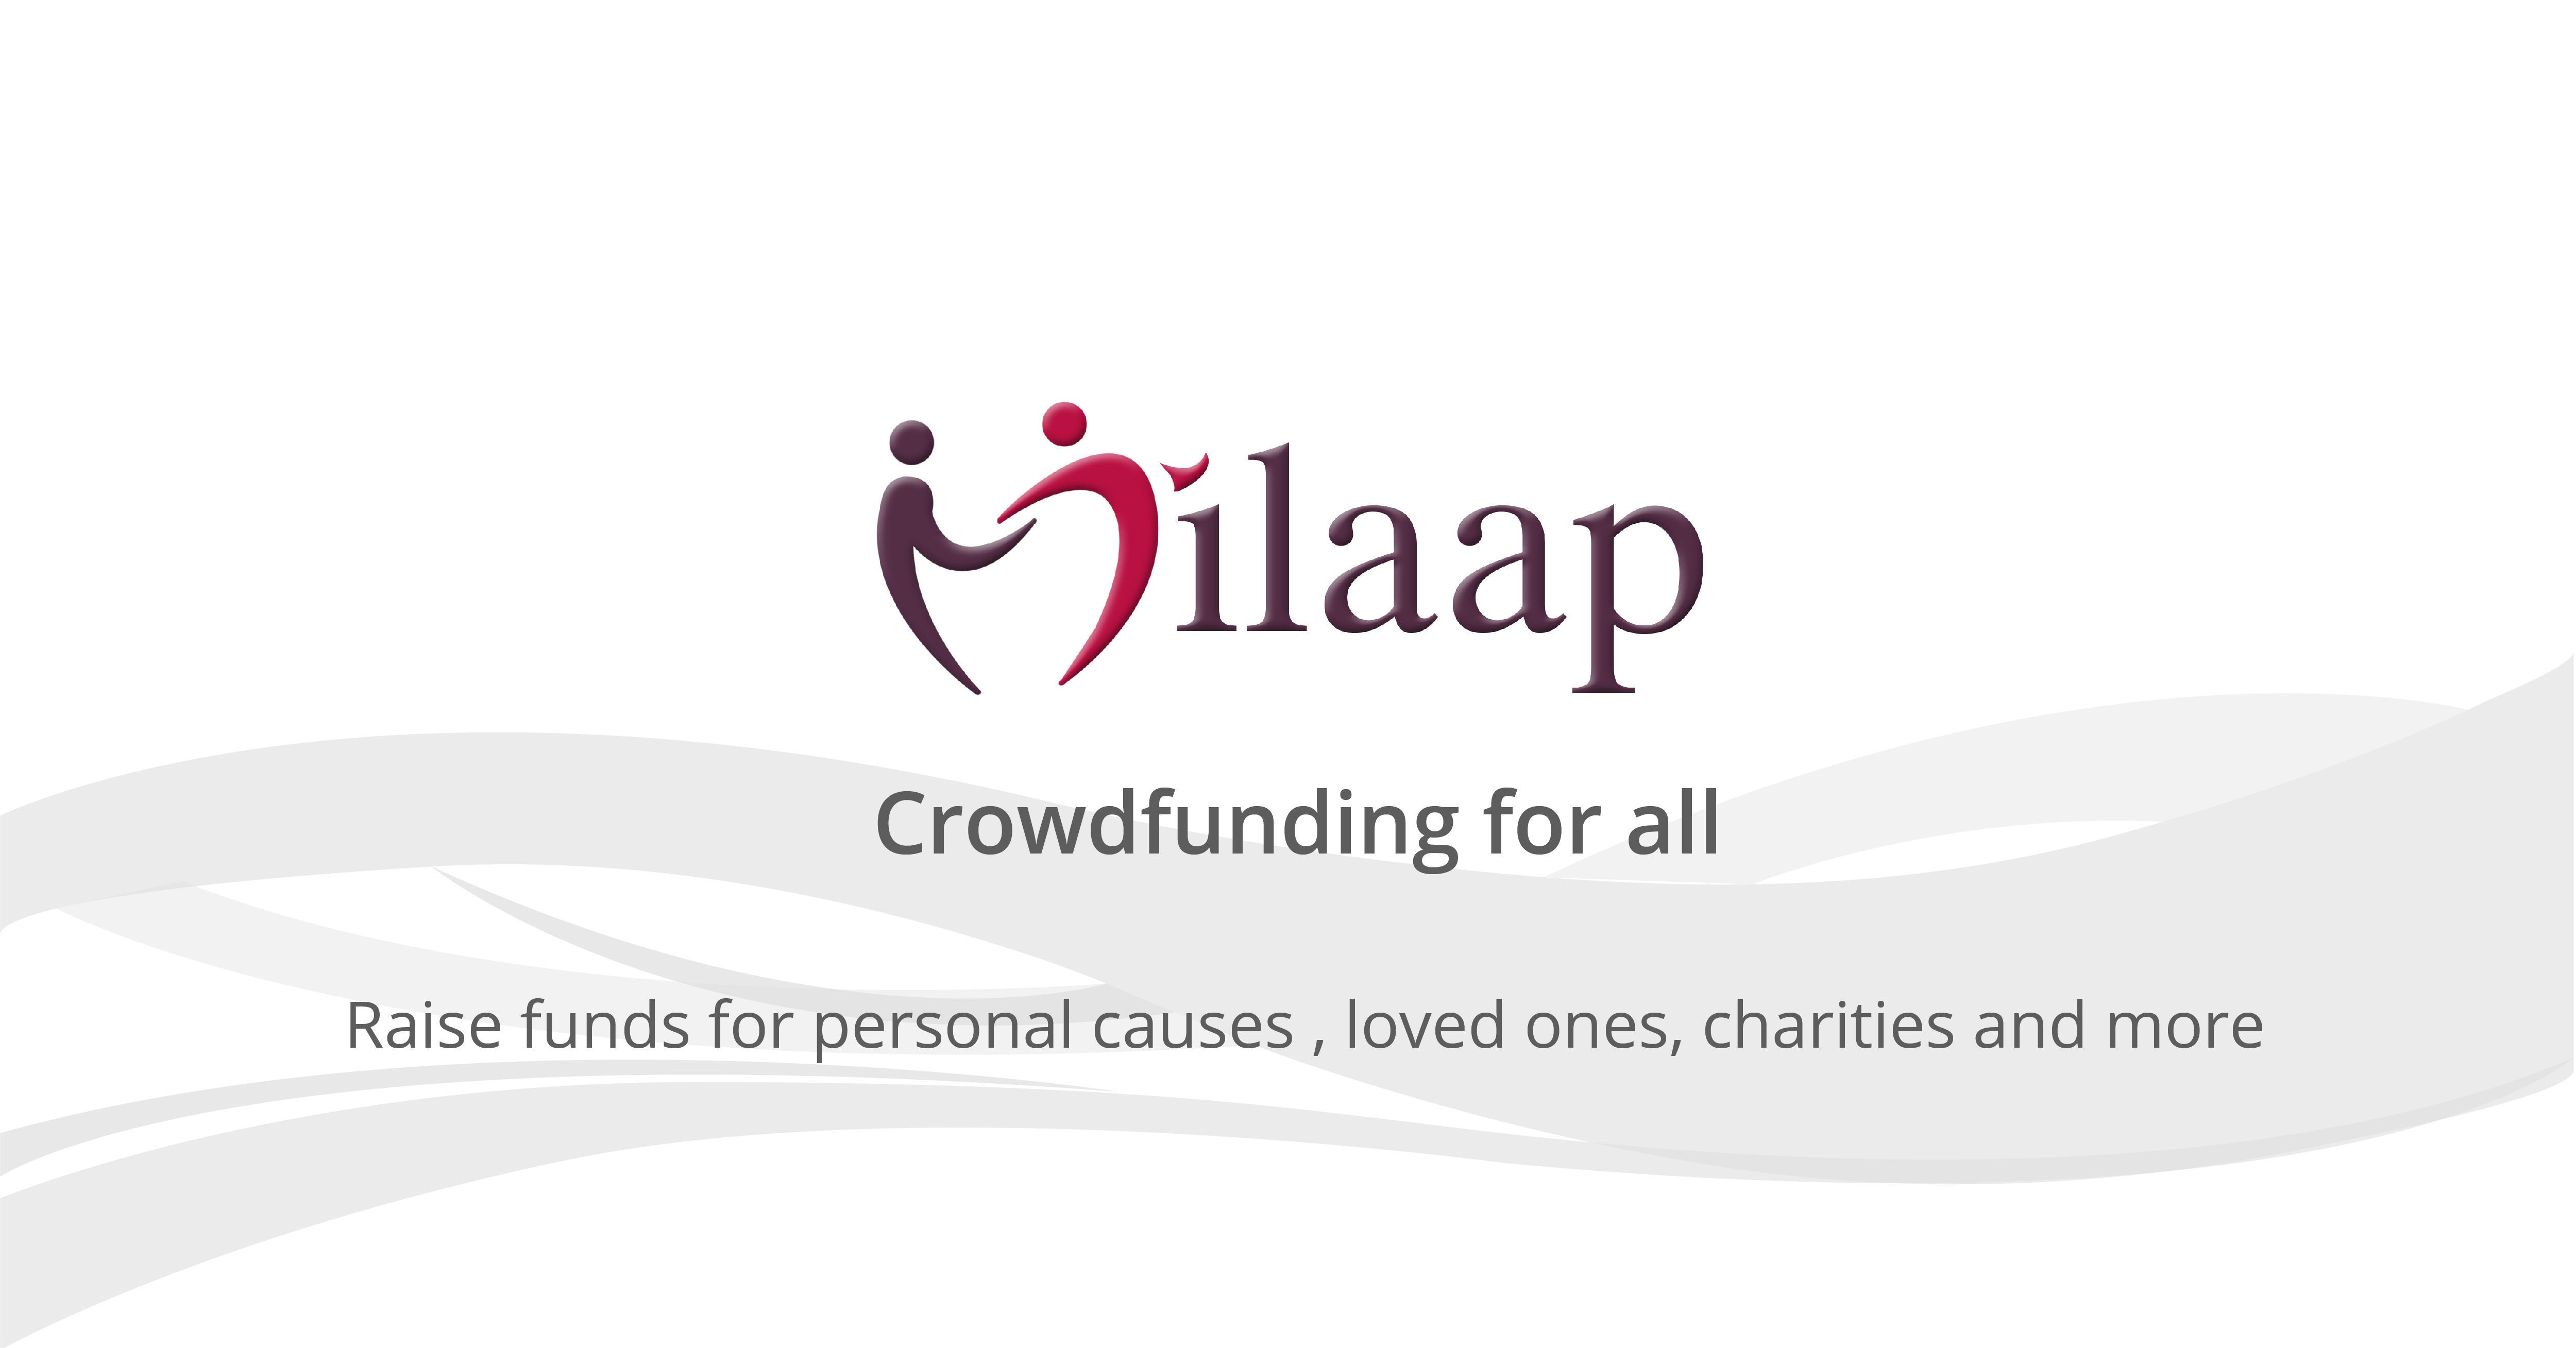 Crowdfunding India st Crowdfunding Platform In India